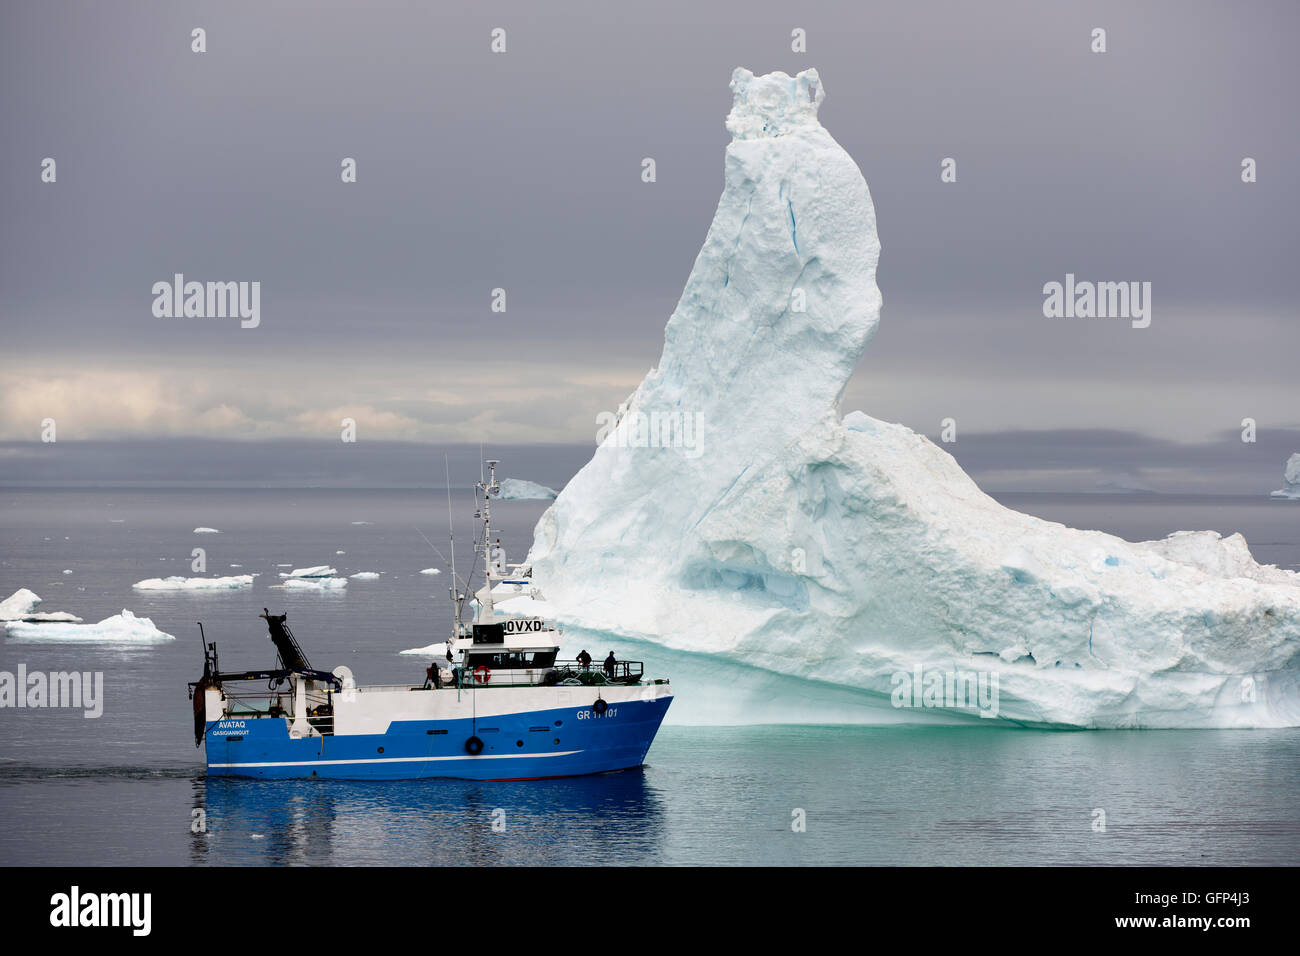 Fishing boat, icebert, Disko Bay, Ilulissat, Greenland - Stock Image